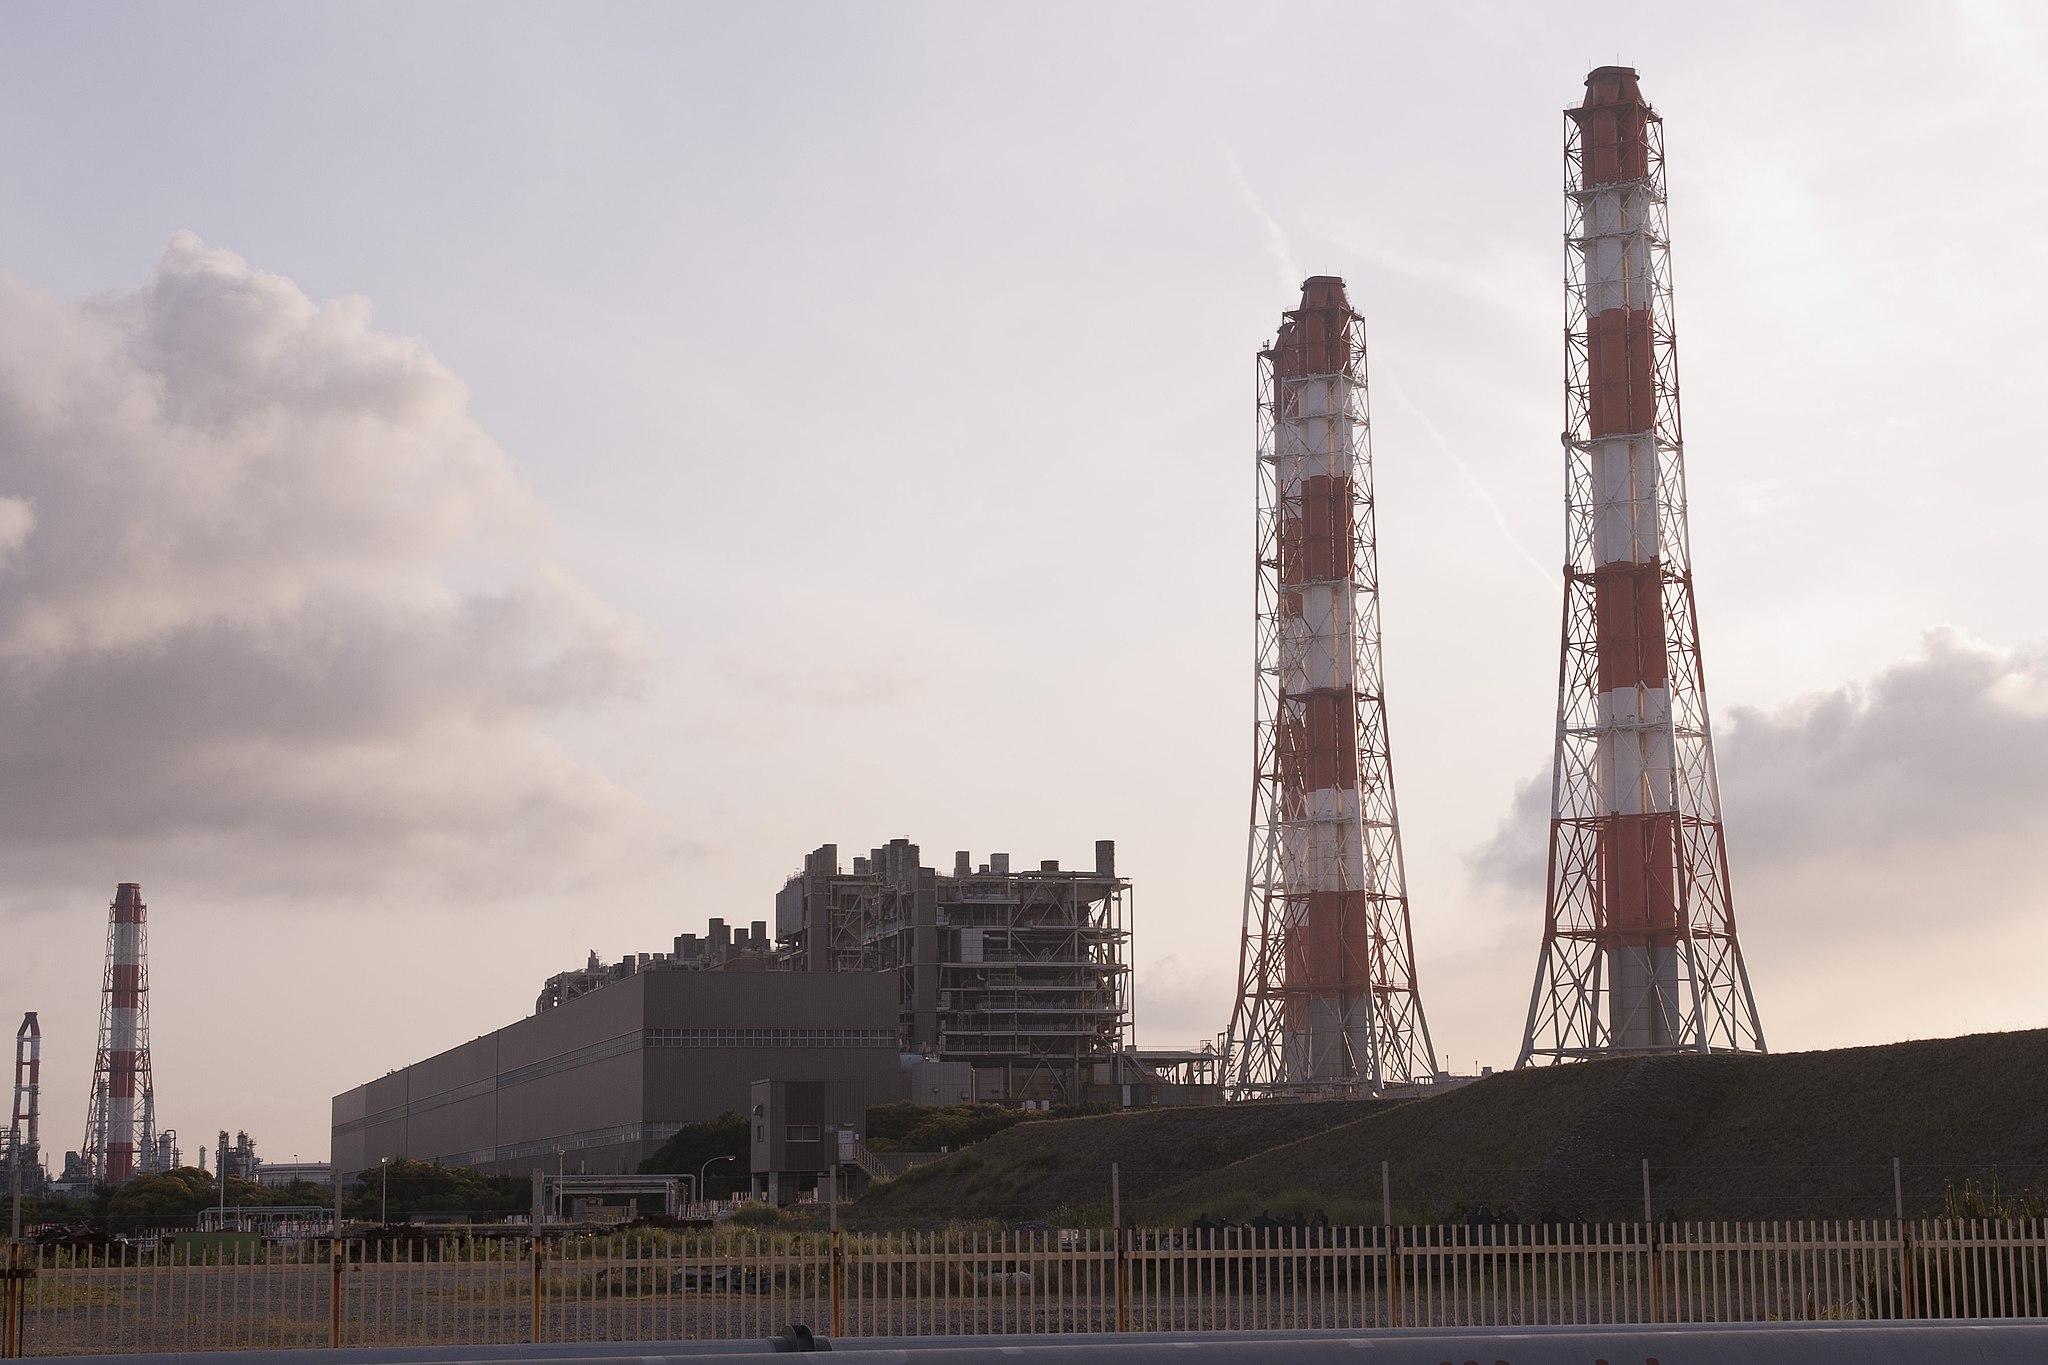 Kashima Thermal Power Plant 02